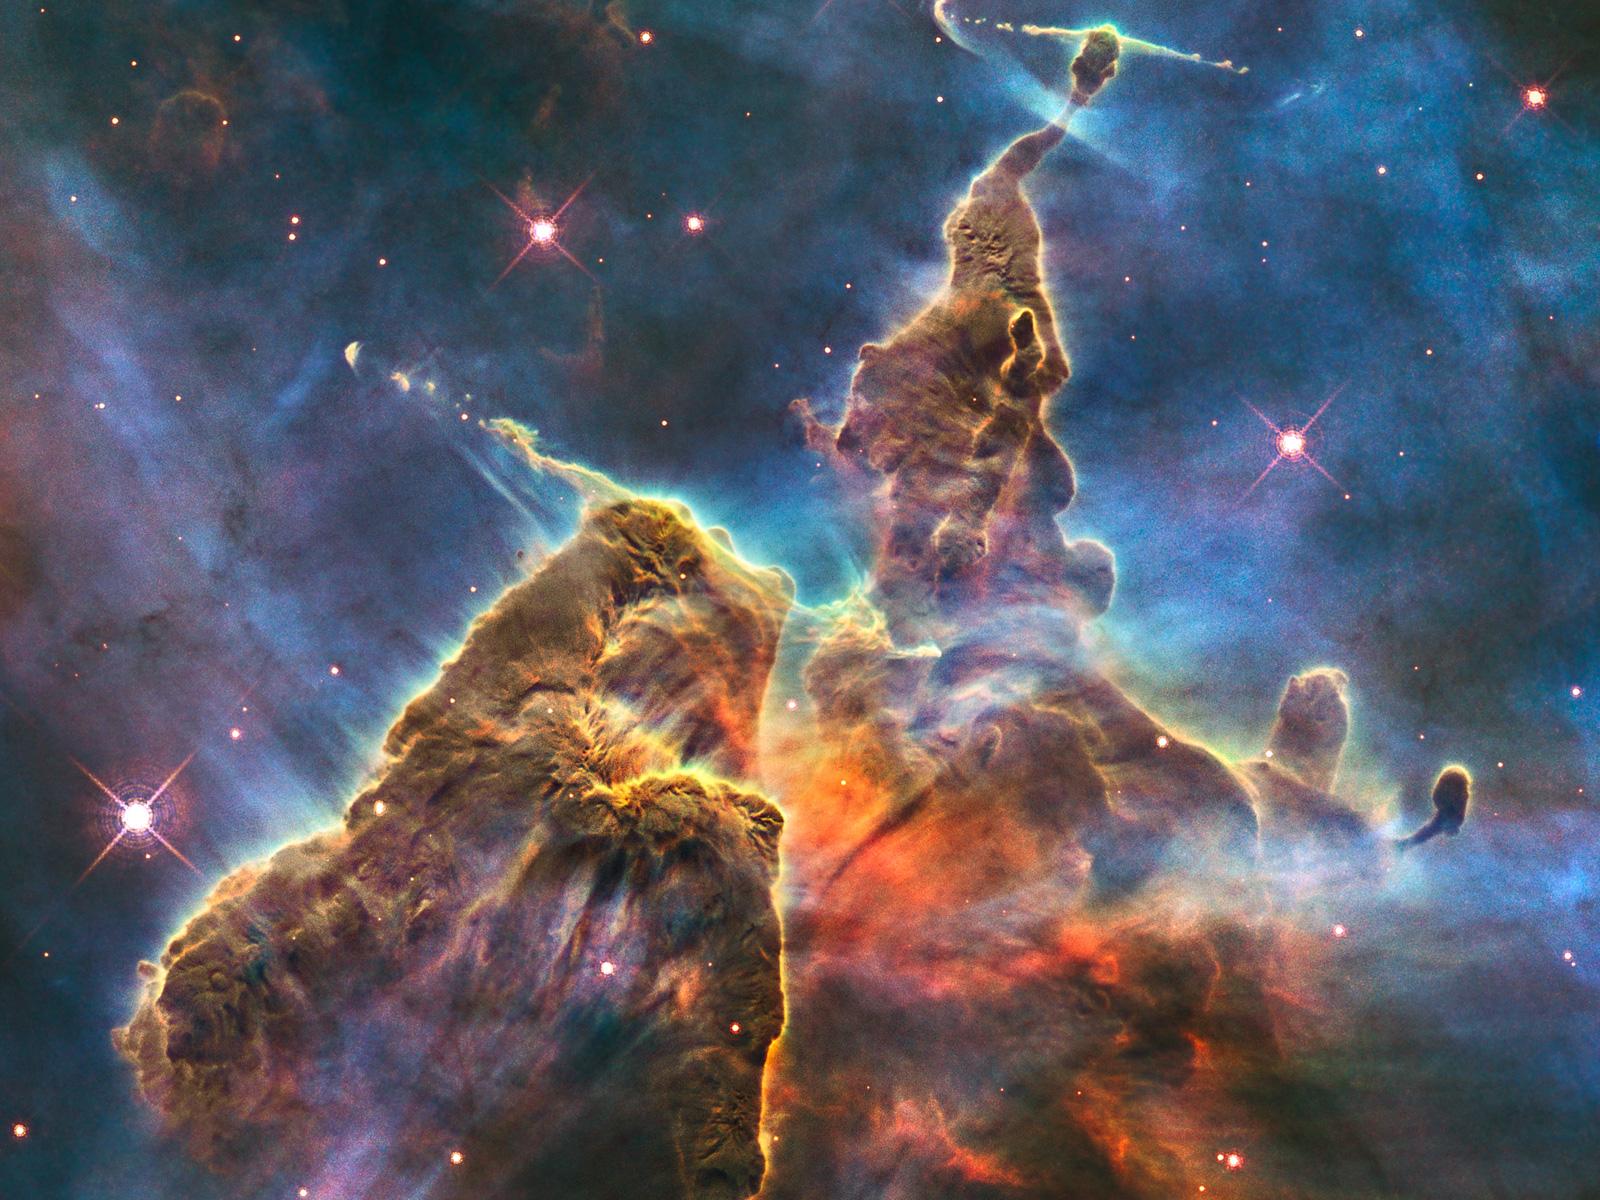 Hubble Space Telescope Wallpaper Images